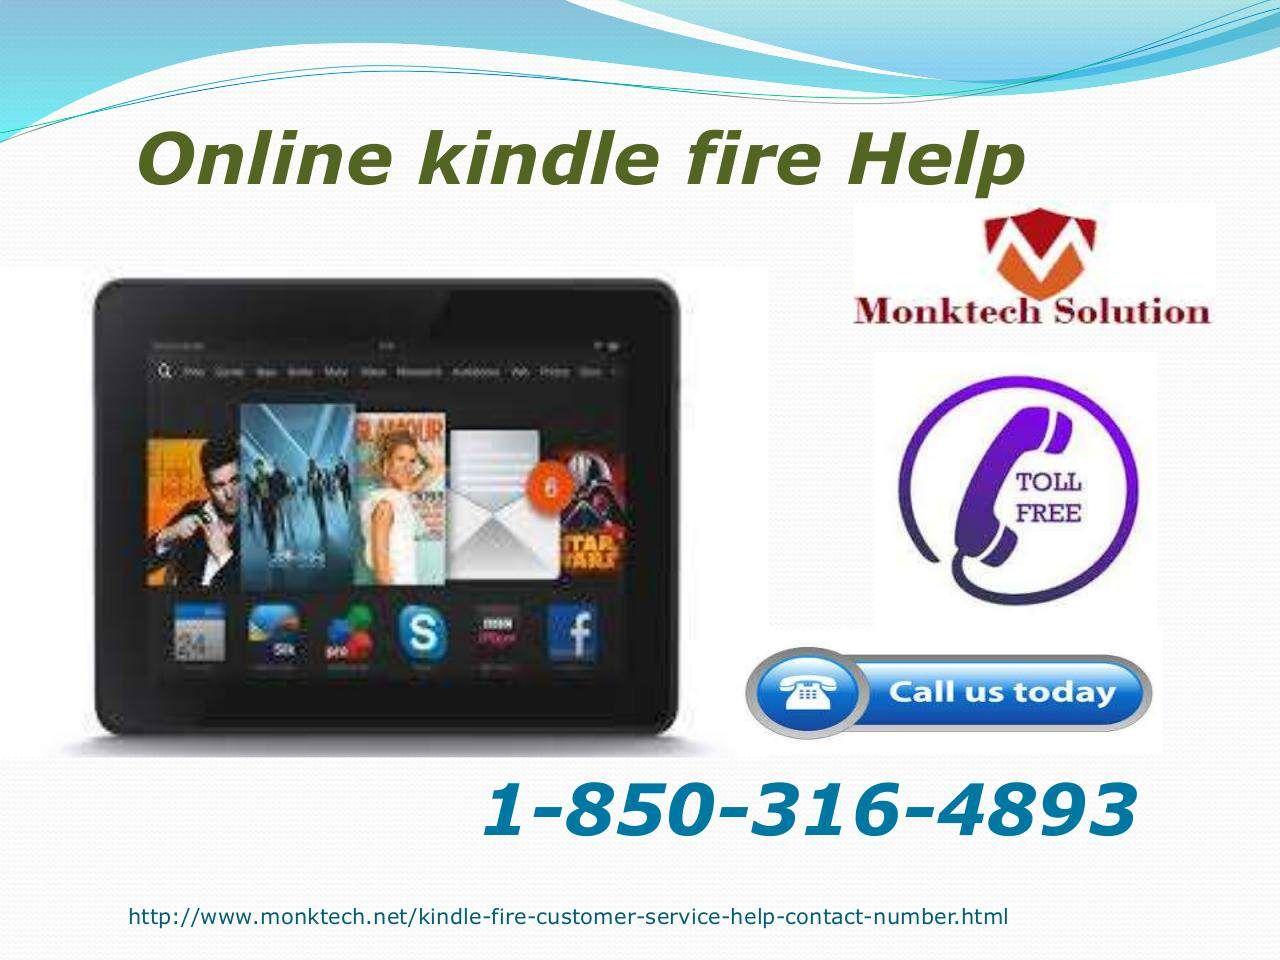 Get the snackable crispy content through our amazon online kindle fire help website 1